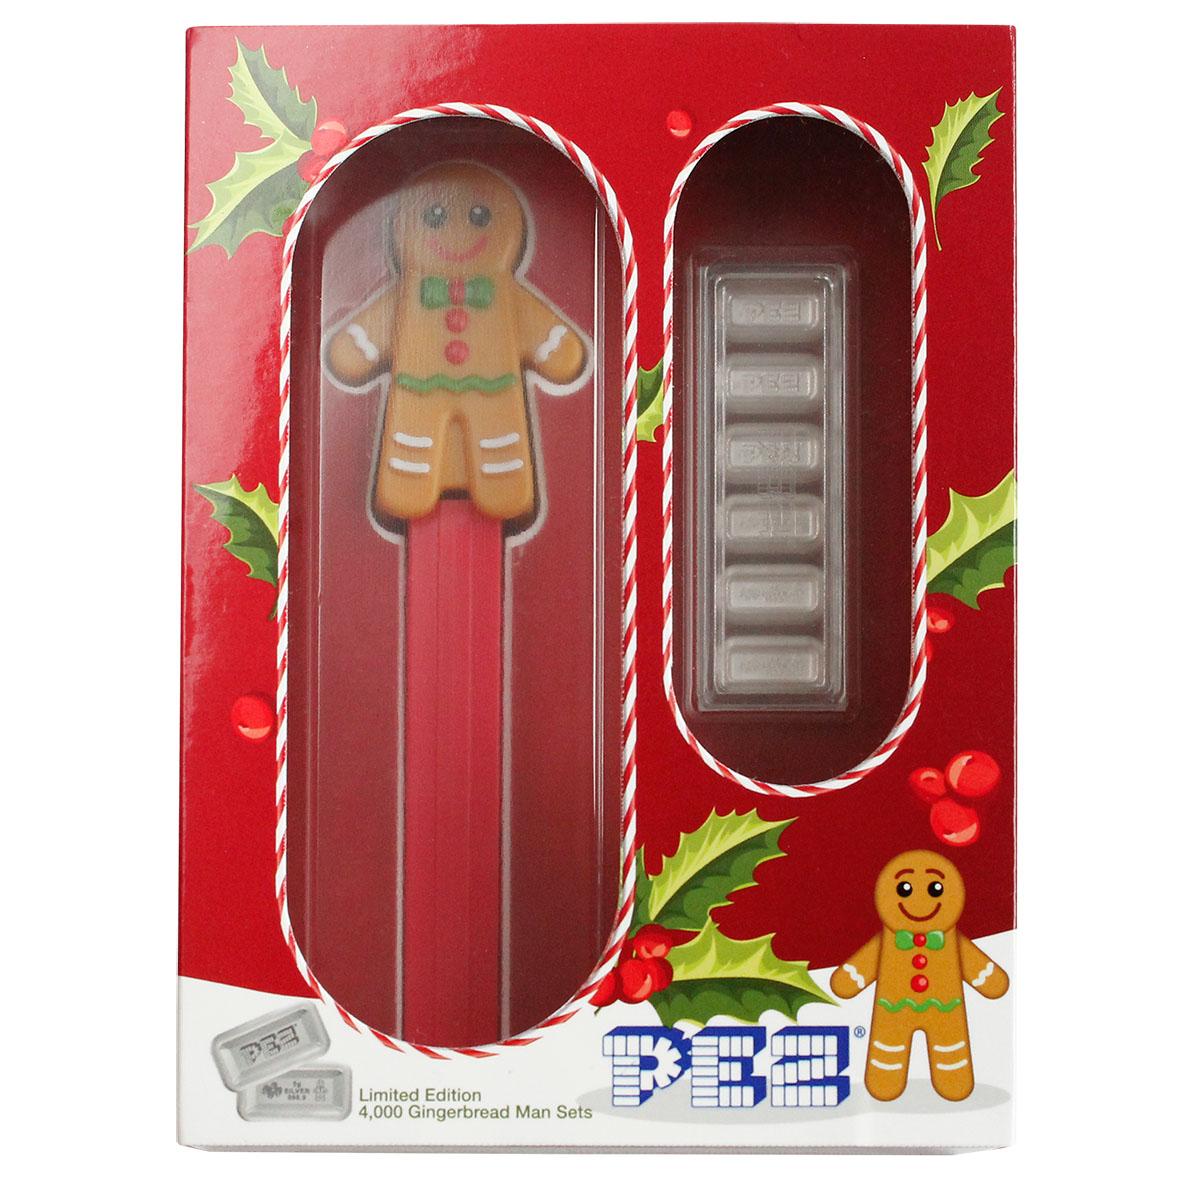 Holiday Gingerbread Man Pez Gift Set  - 6x5 gram Silver Bars